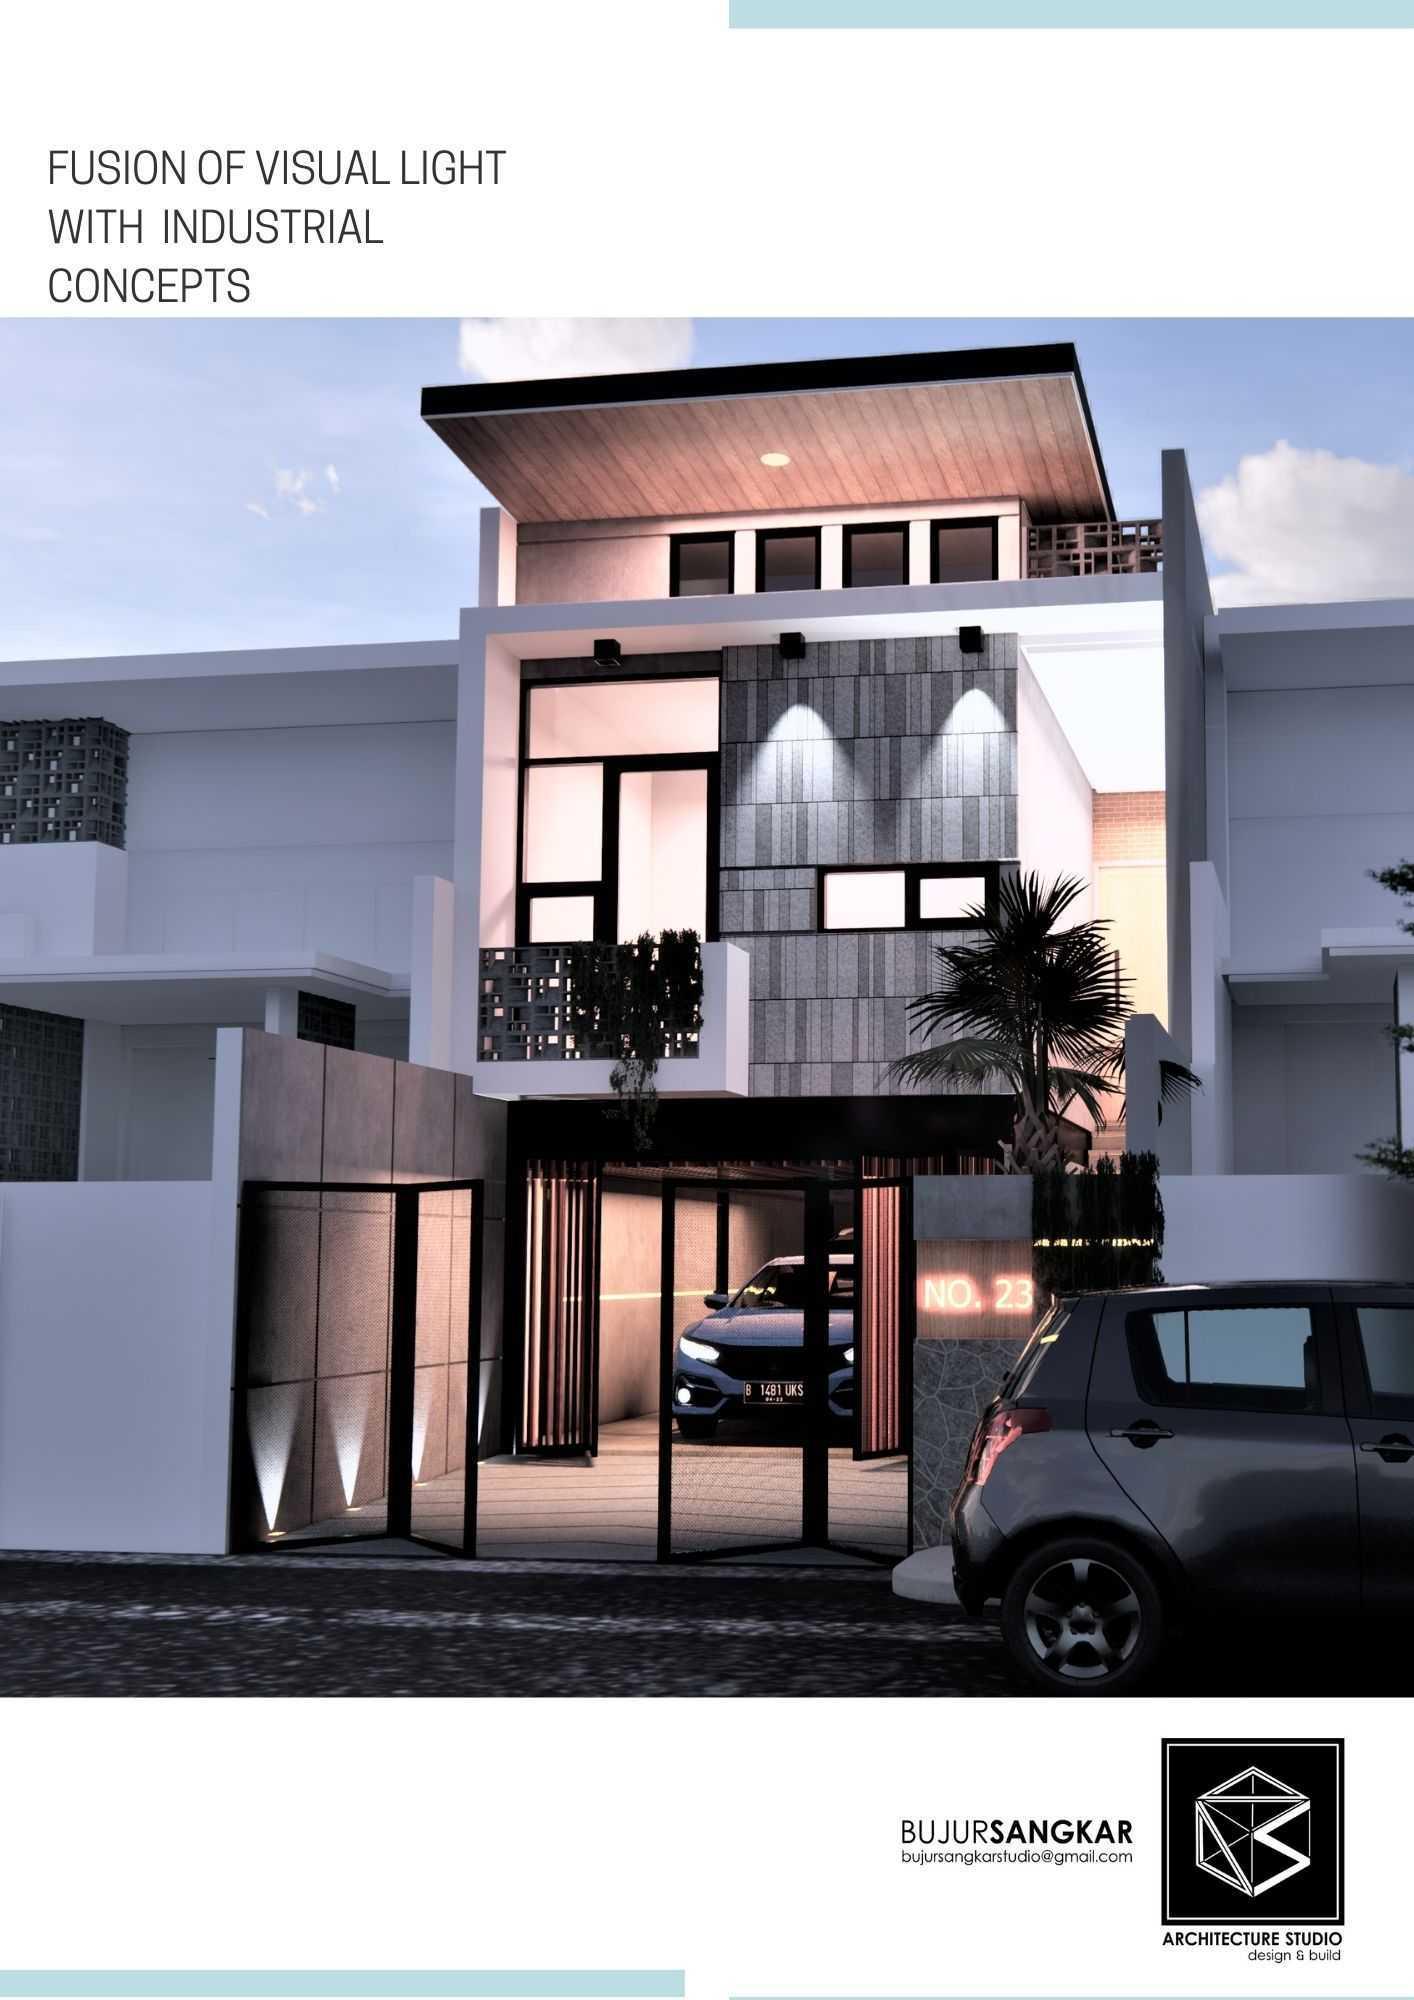 Bujursangkar Architect Fusion Of Visual Light With Industrial Concepts . Makassar, Kota Makassar, Sulawesi Selatan, Indonesia Makassar, Kota Makassar, Sulawesi Selatan, Indonesia Fusion Of Visual Light With Industrial Concepts Minimalist 111333